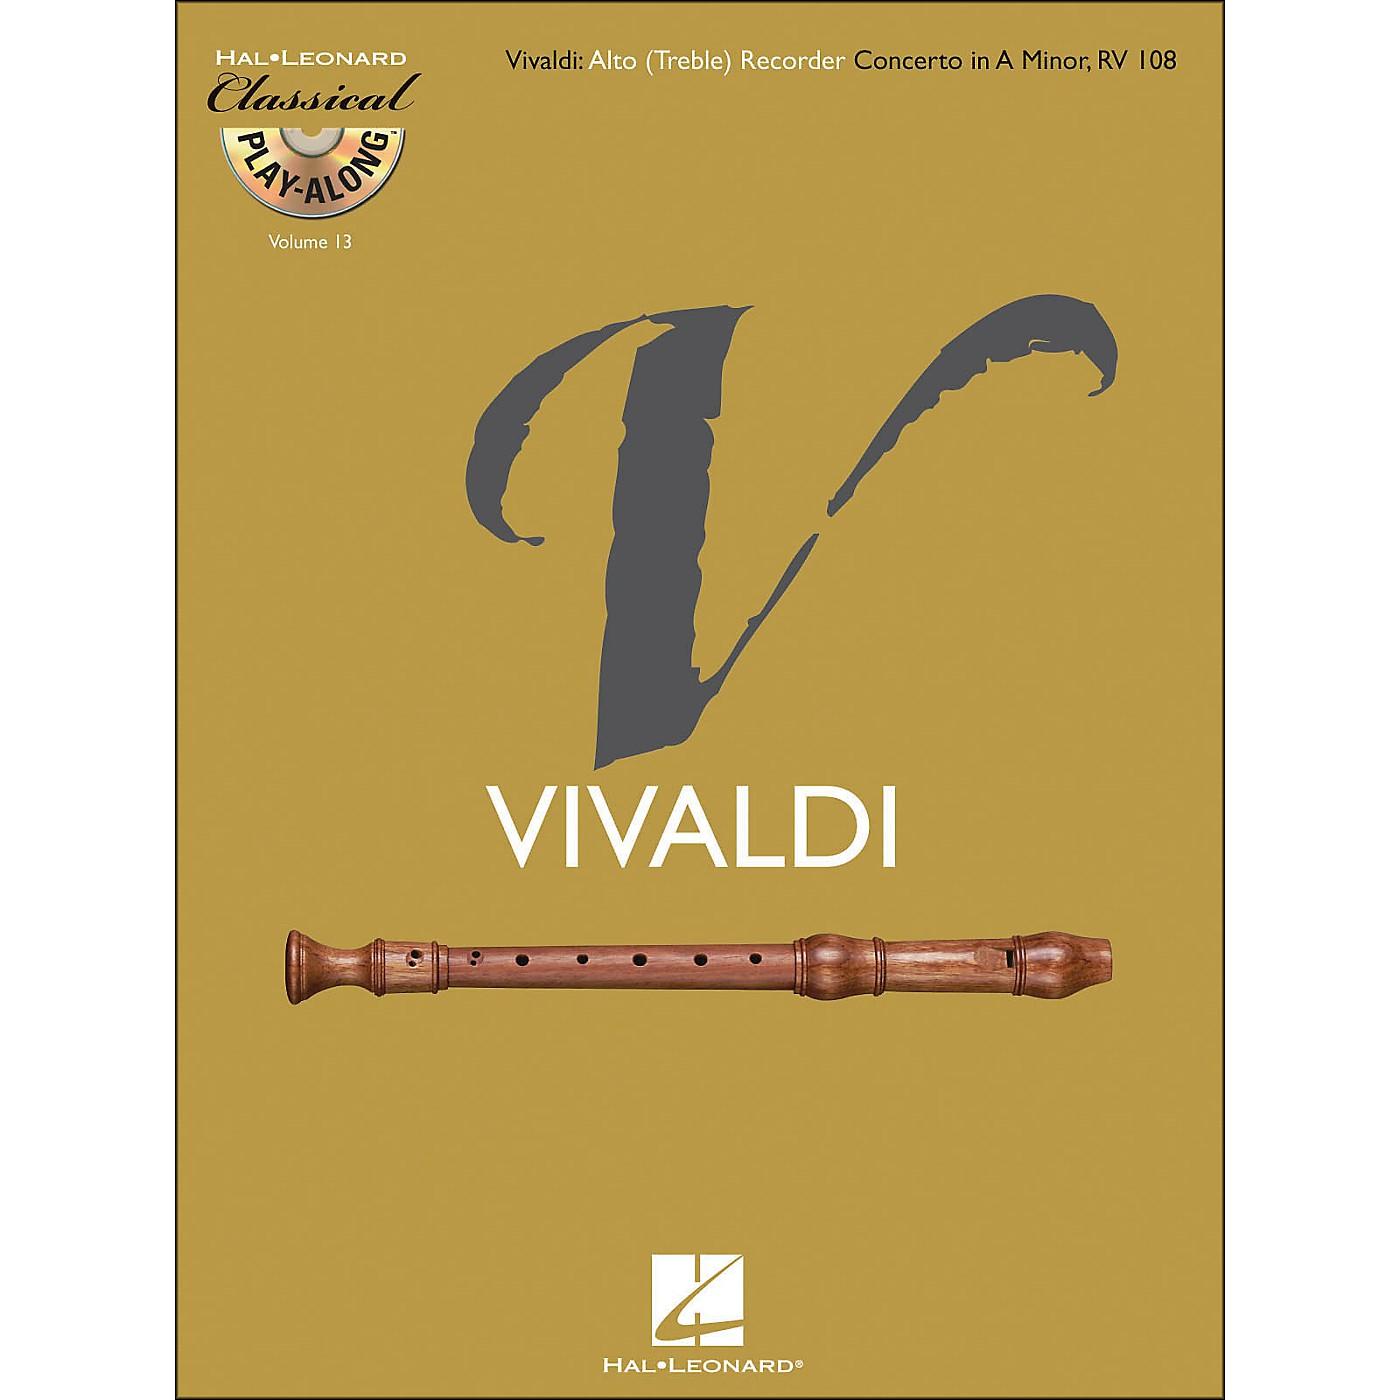 Hal Leonard Vivaldi: Alto (Treble) Recorder Concerto In A Minor Rv 108Class Play-Along Vol.13 Book/CD thumbnail